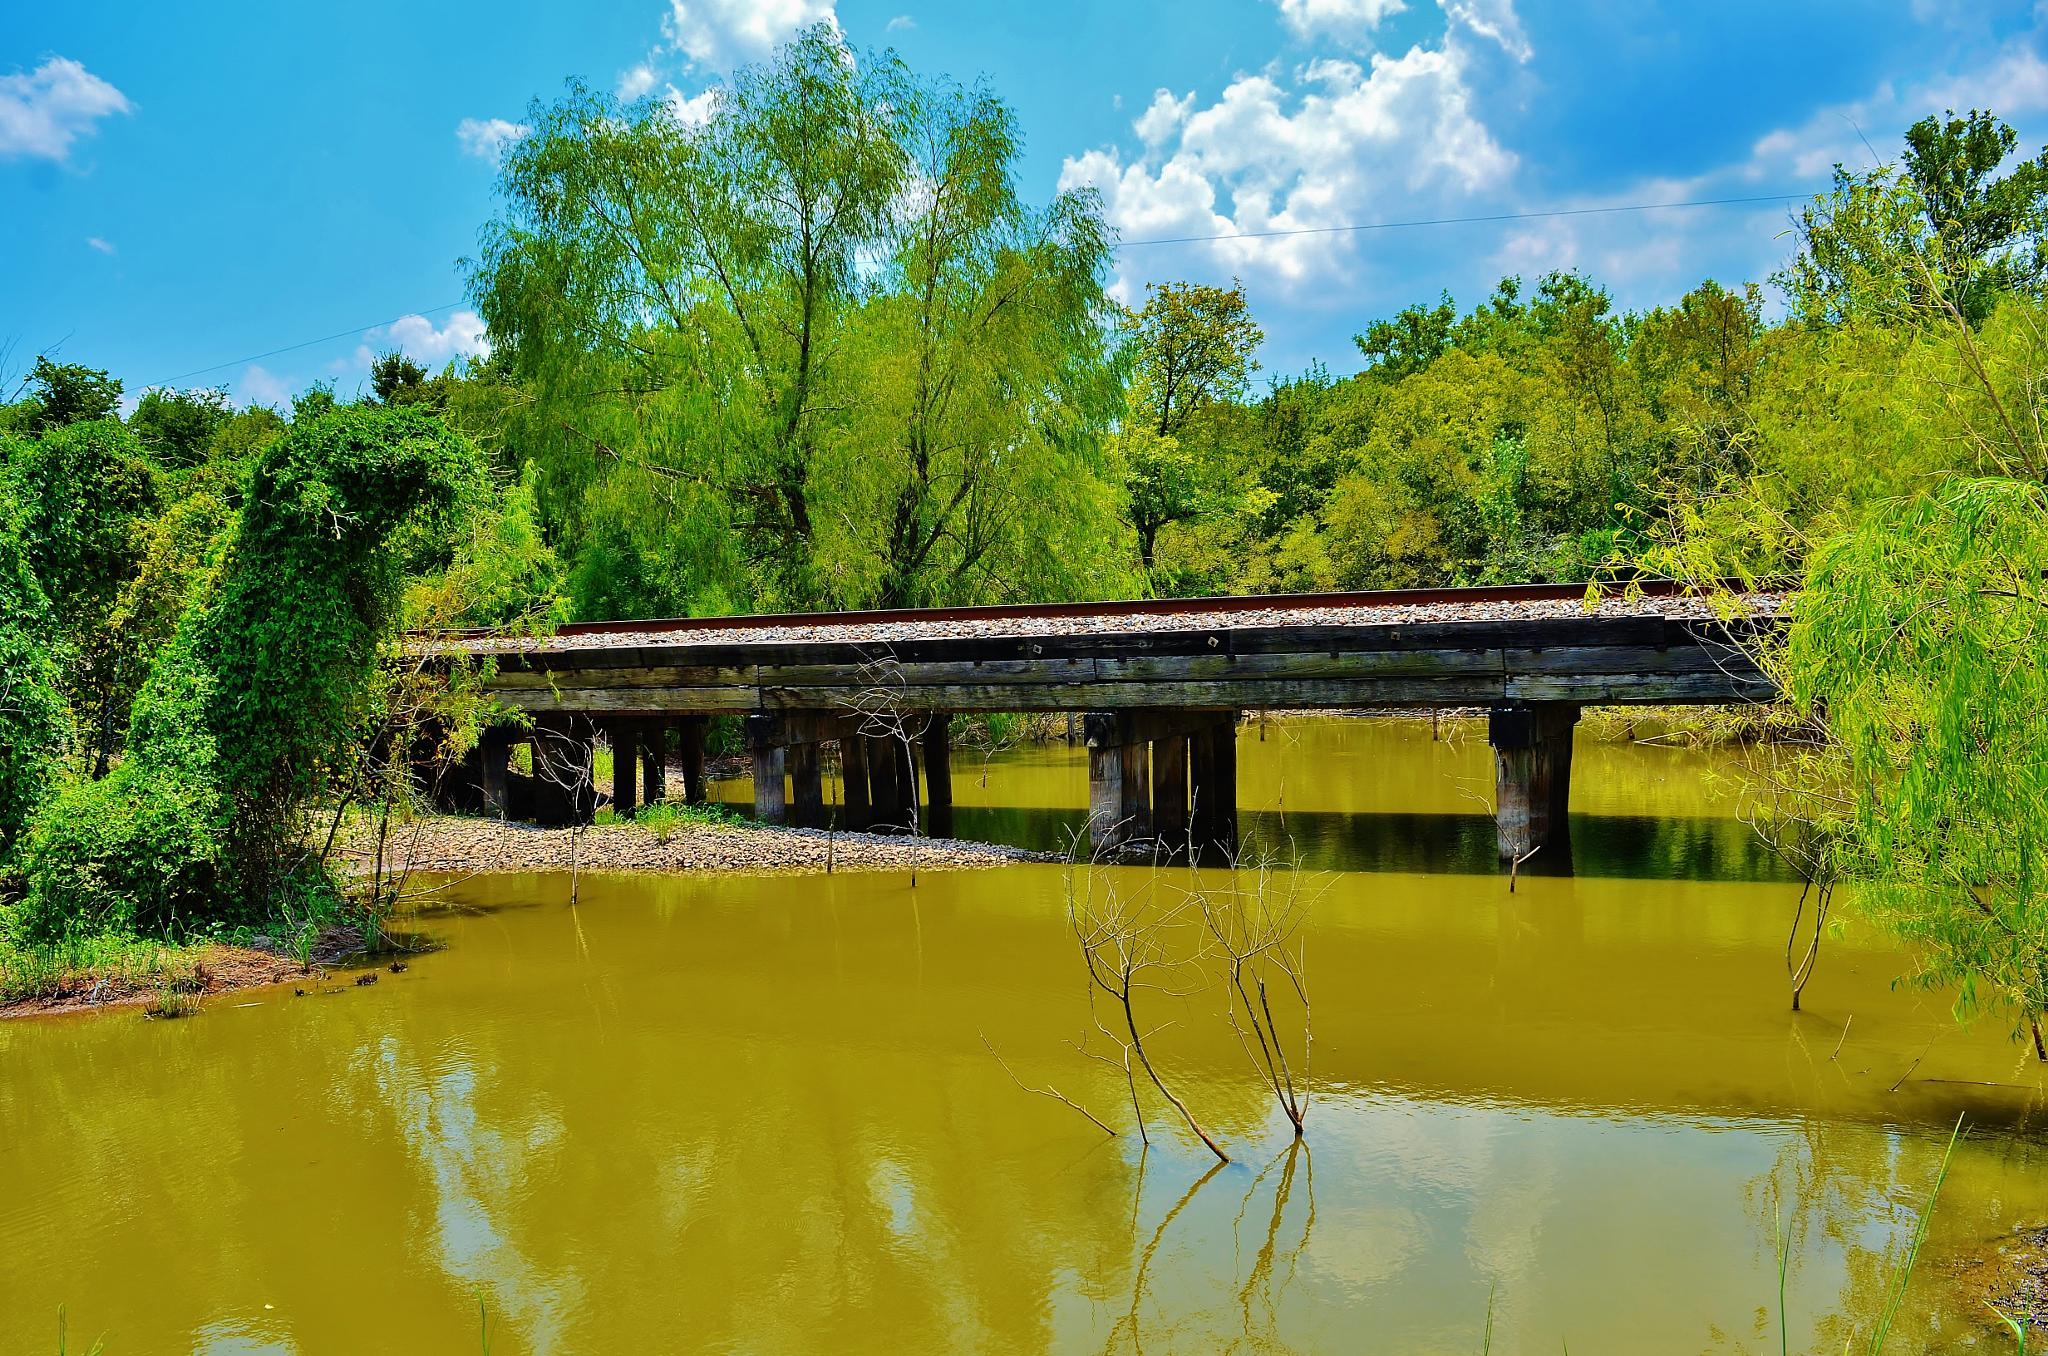 Crossing The Creek II  2866 by Jim Suter